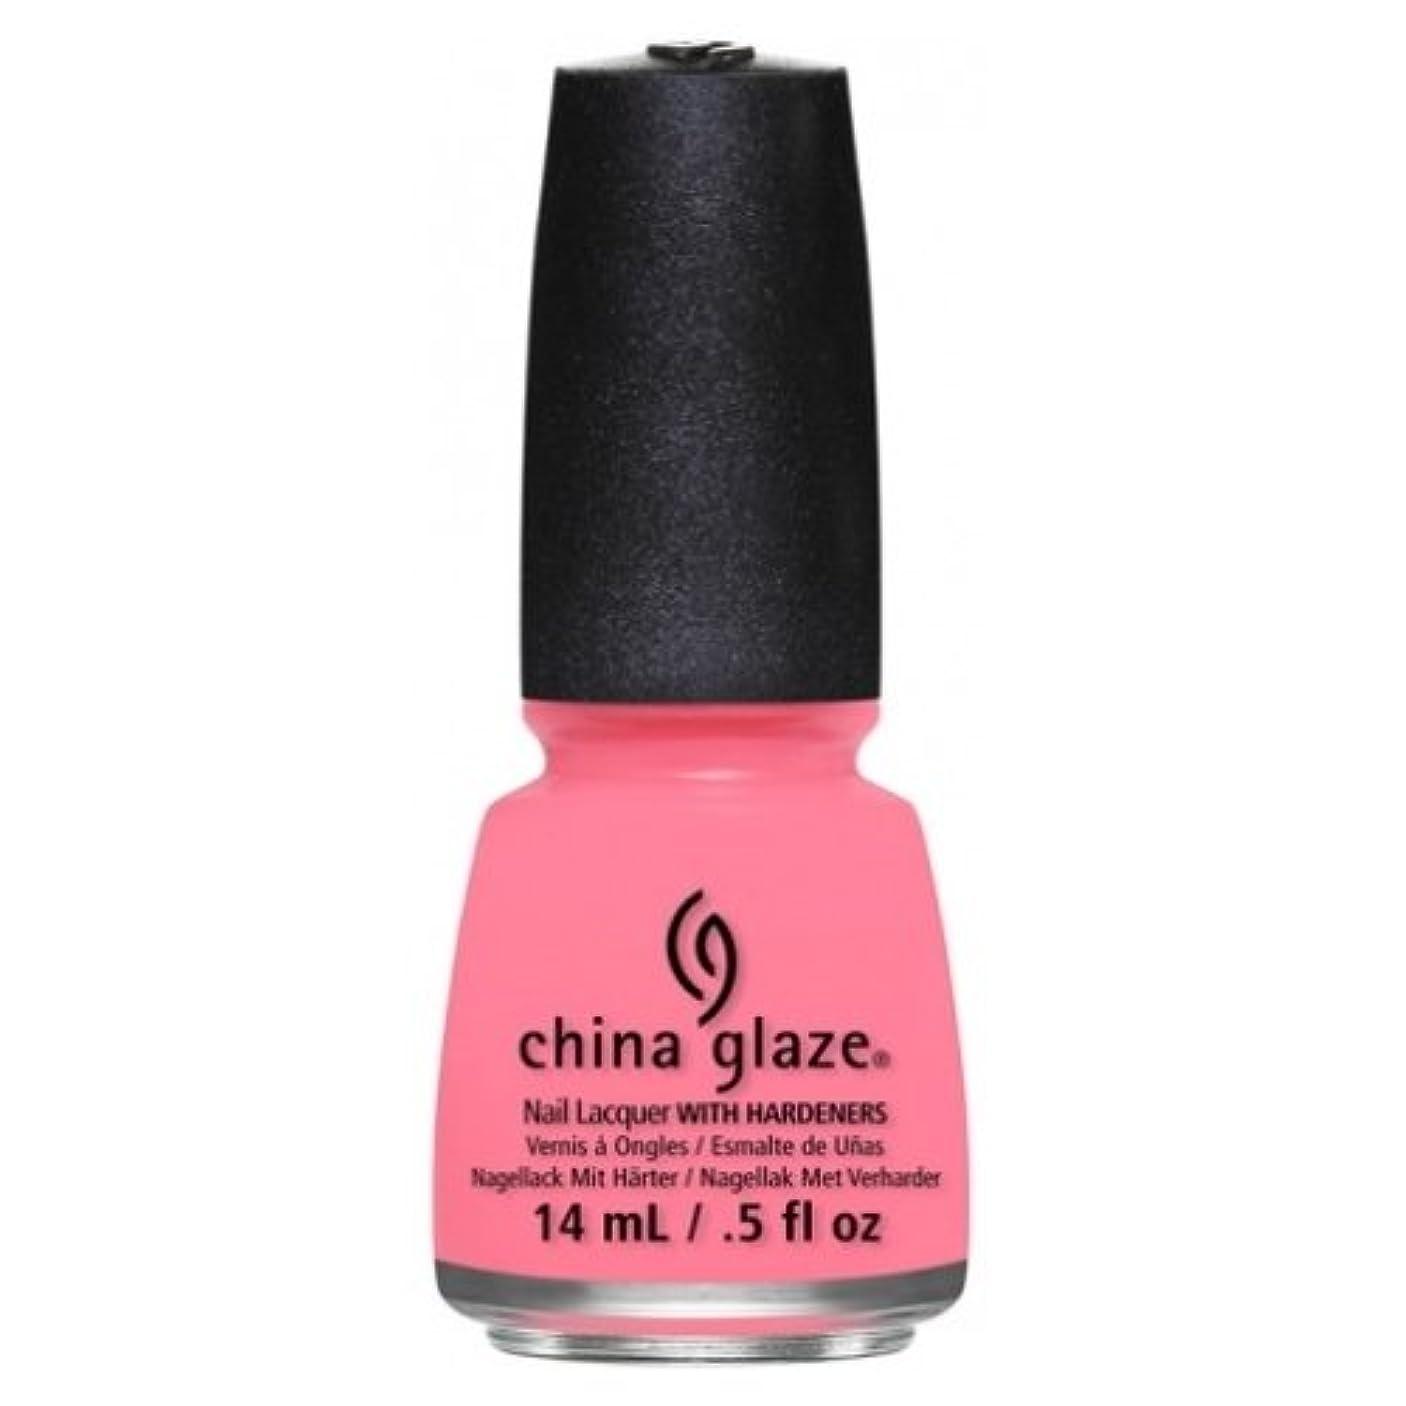 CHINA GLAZE Nail Lacquer - Art City Flourish - Petal To The Metal (並行輸入品)